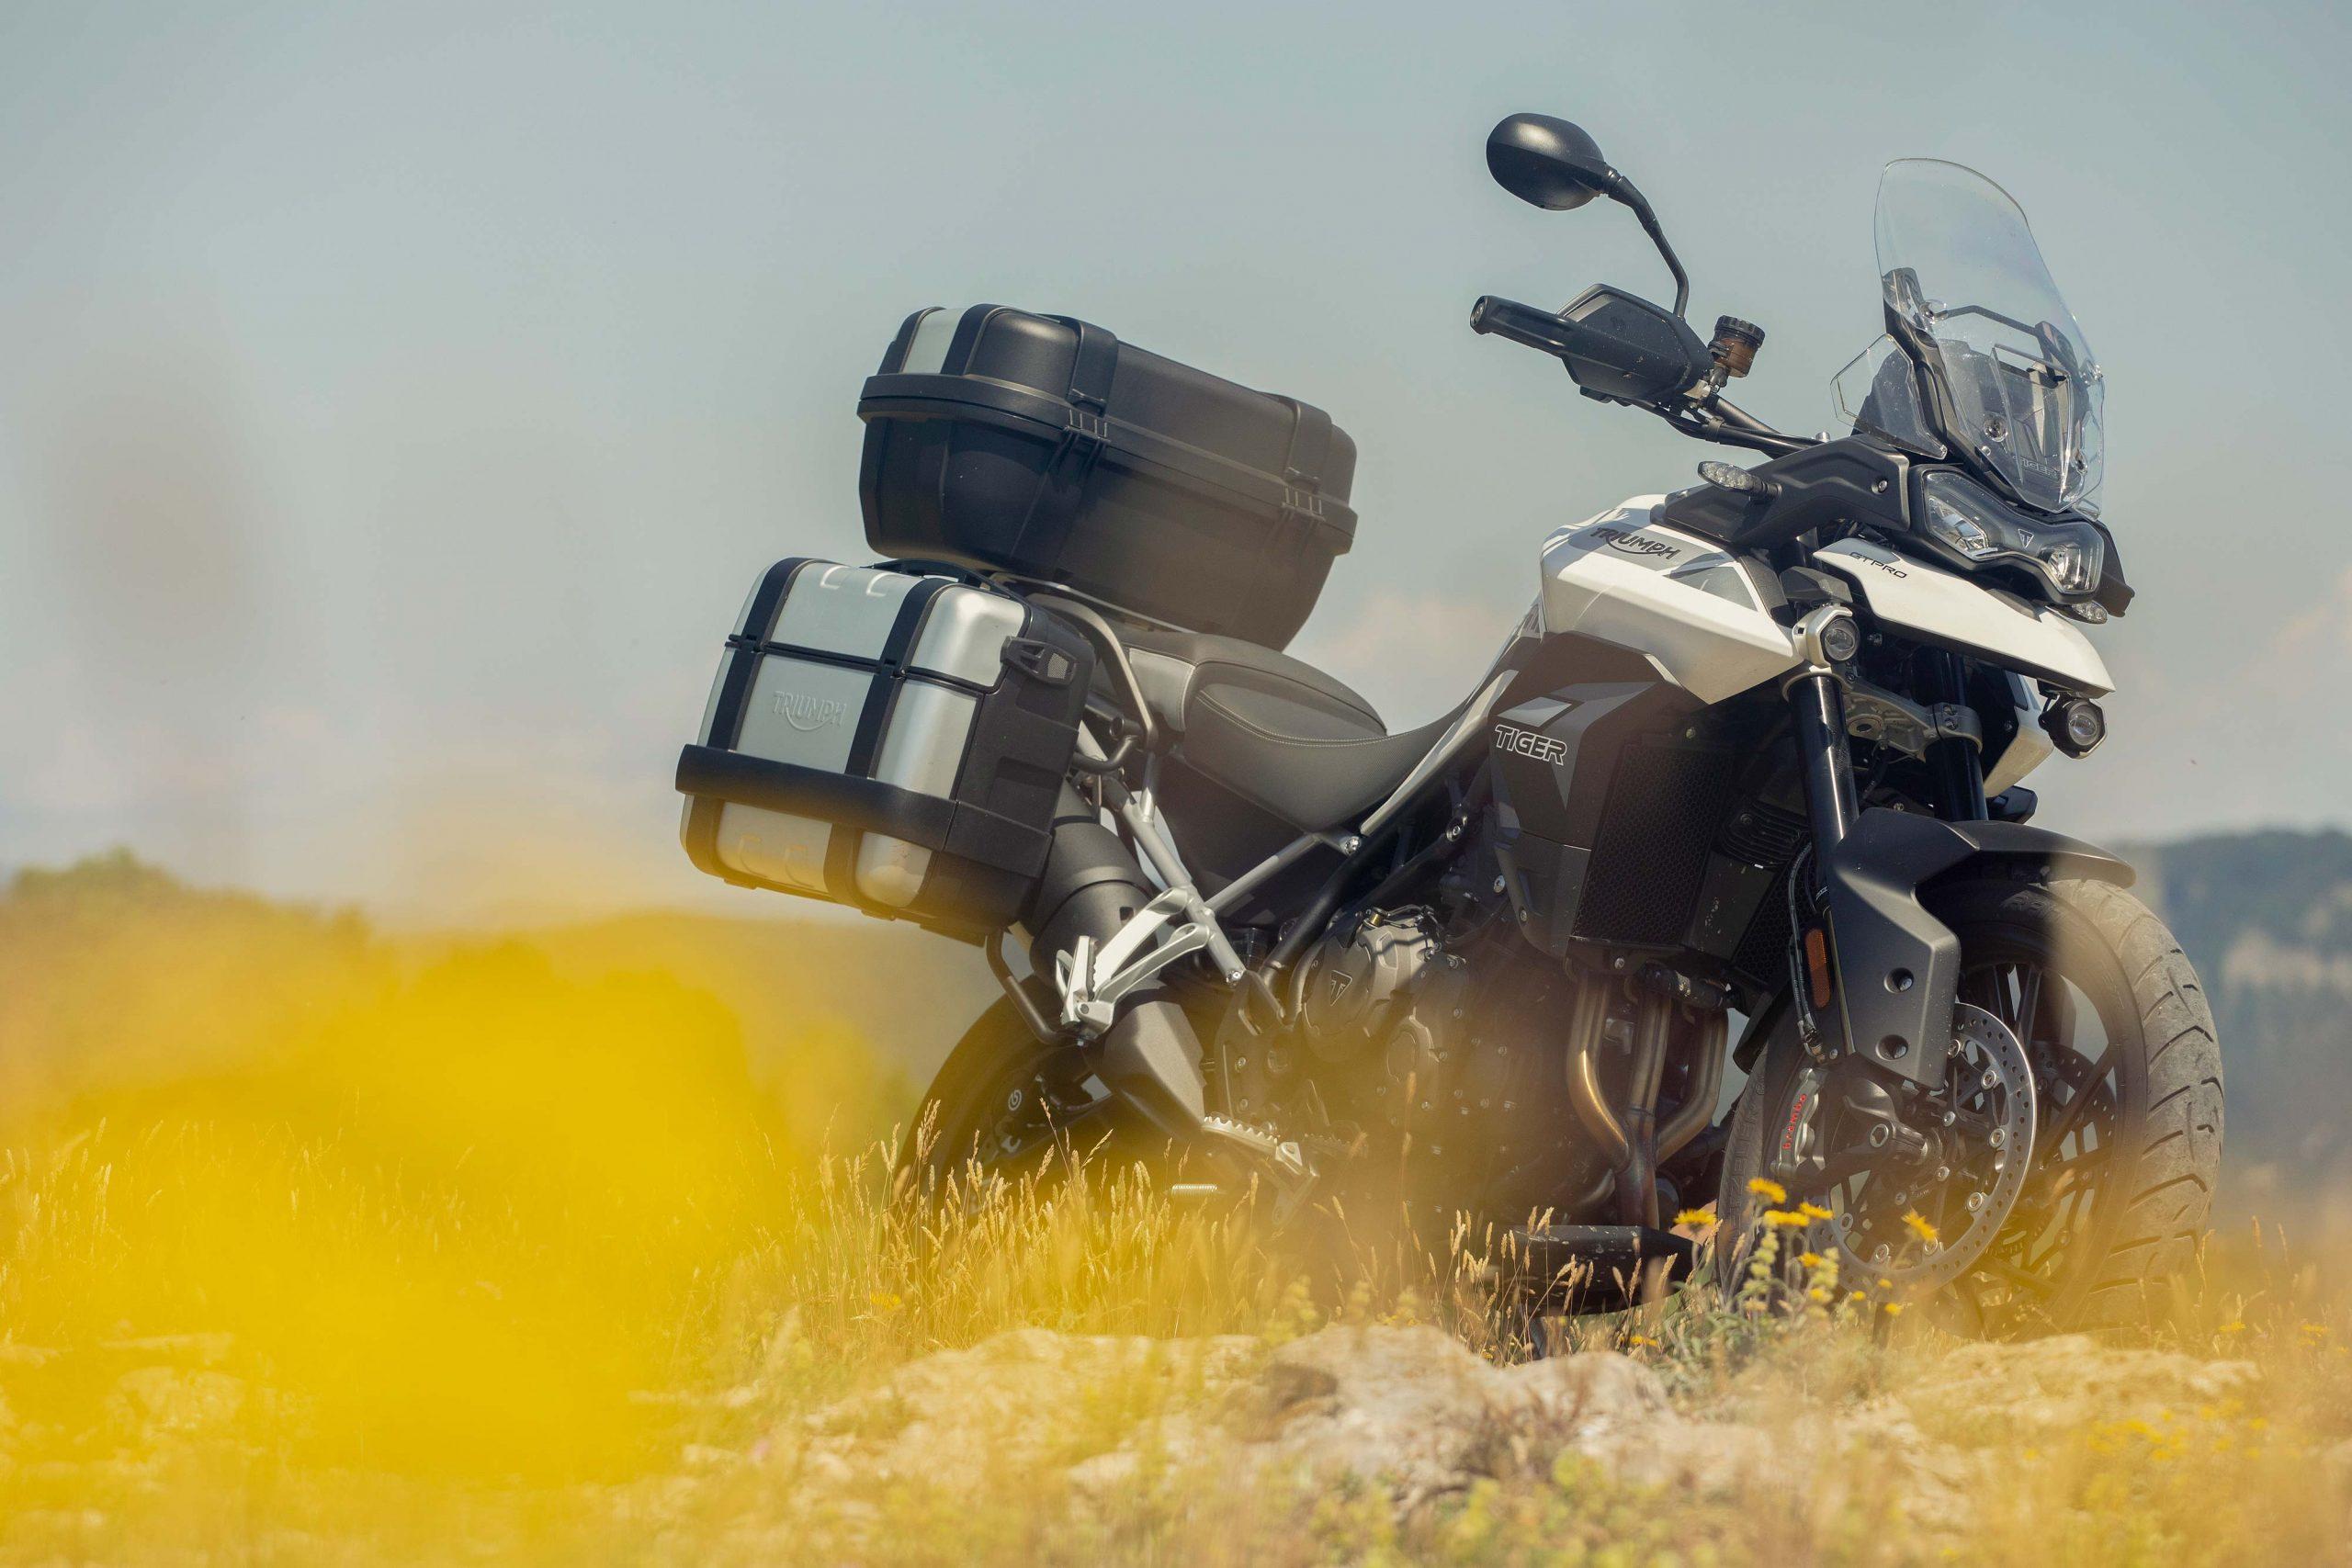 013_TriumphTiger-motosnet-mariapujol-fotografobarcelona